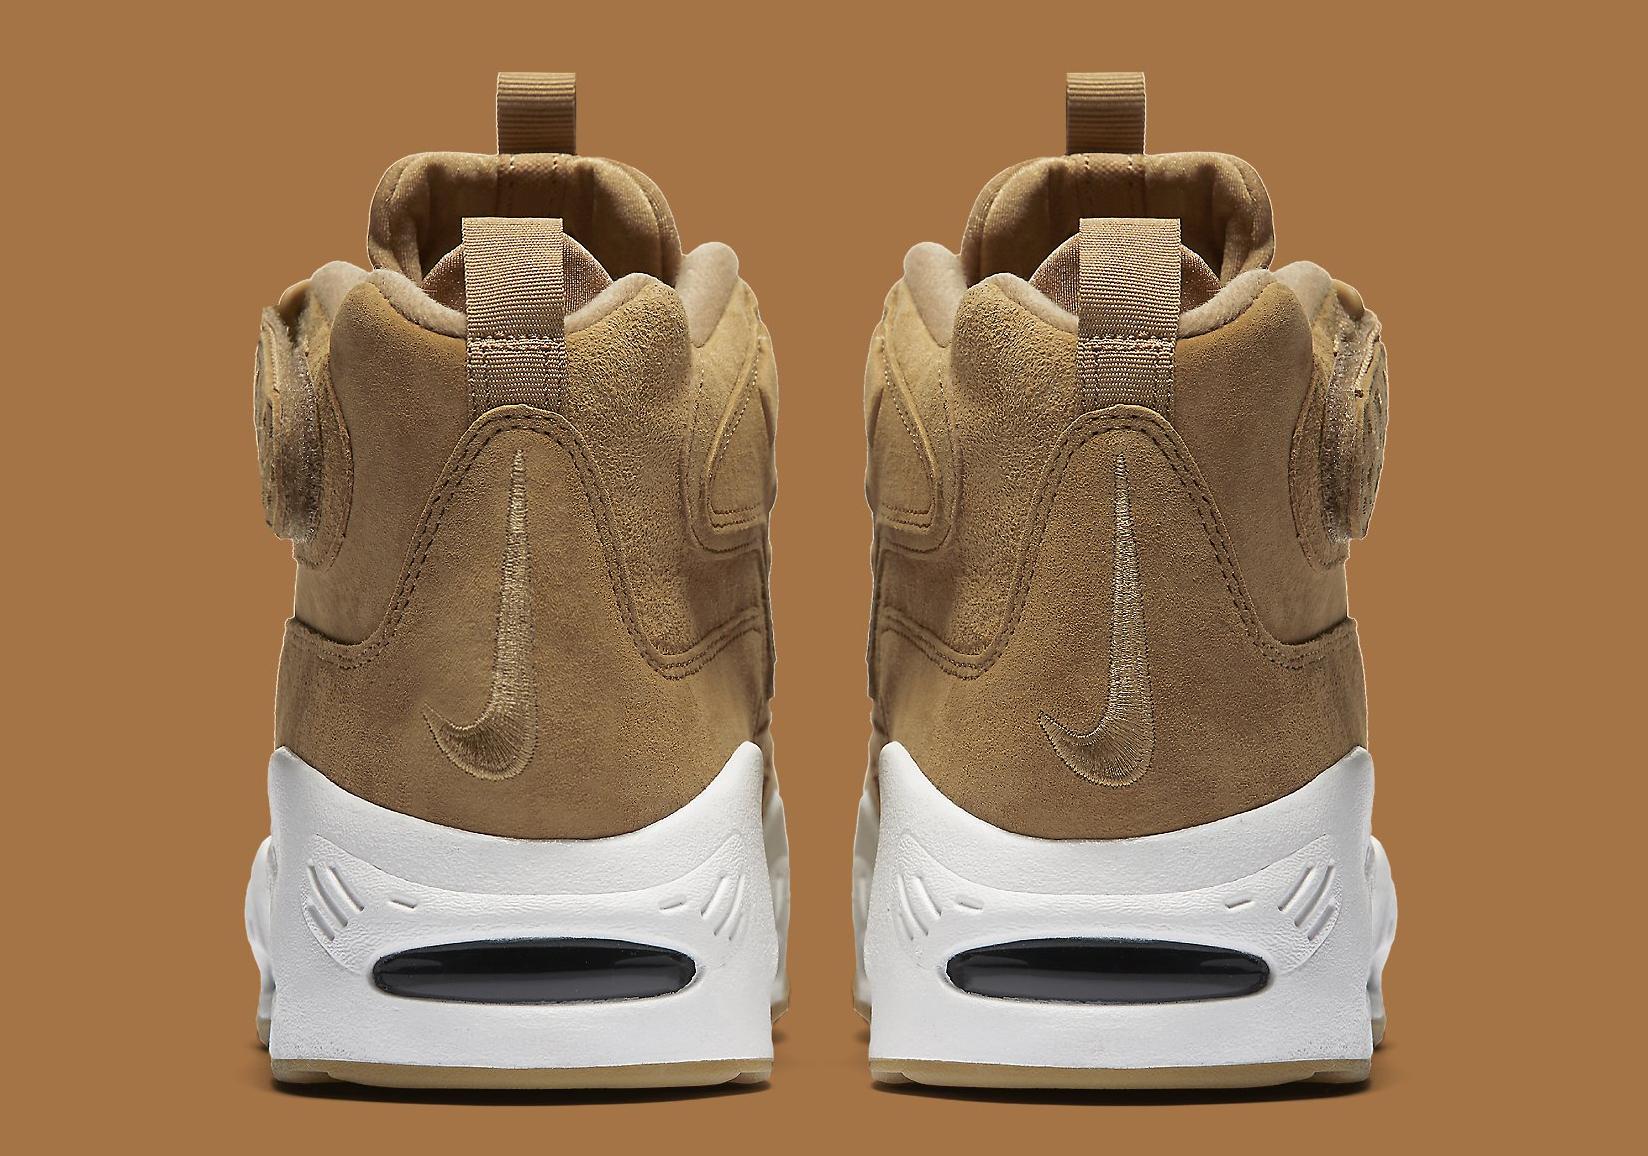 Wheat Nike Griffey Max 1 354912-200 Heel